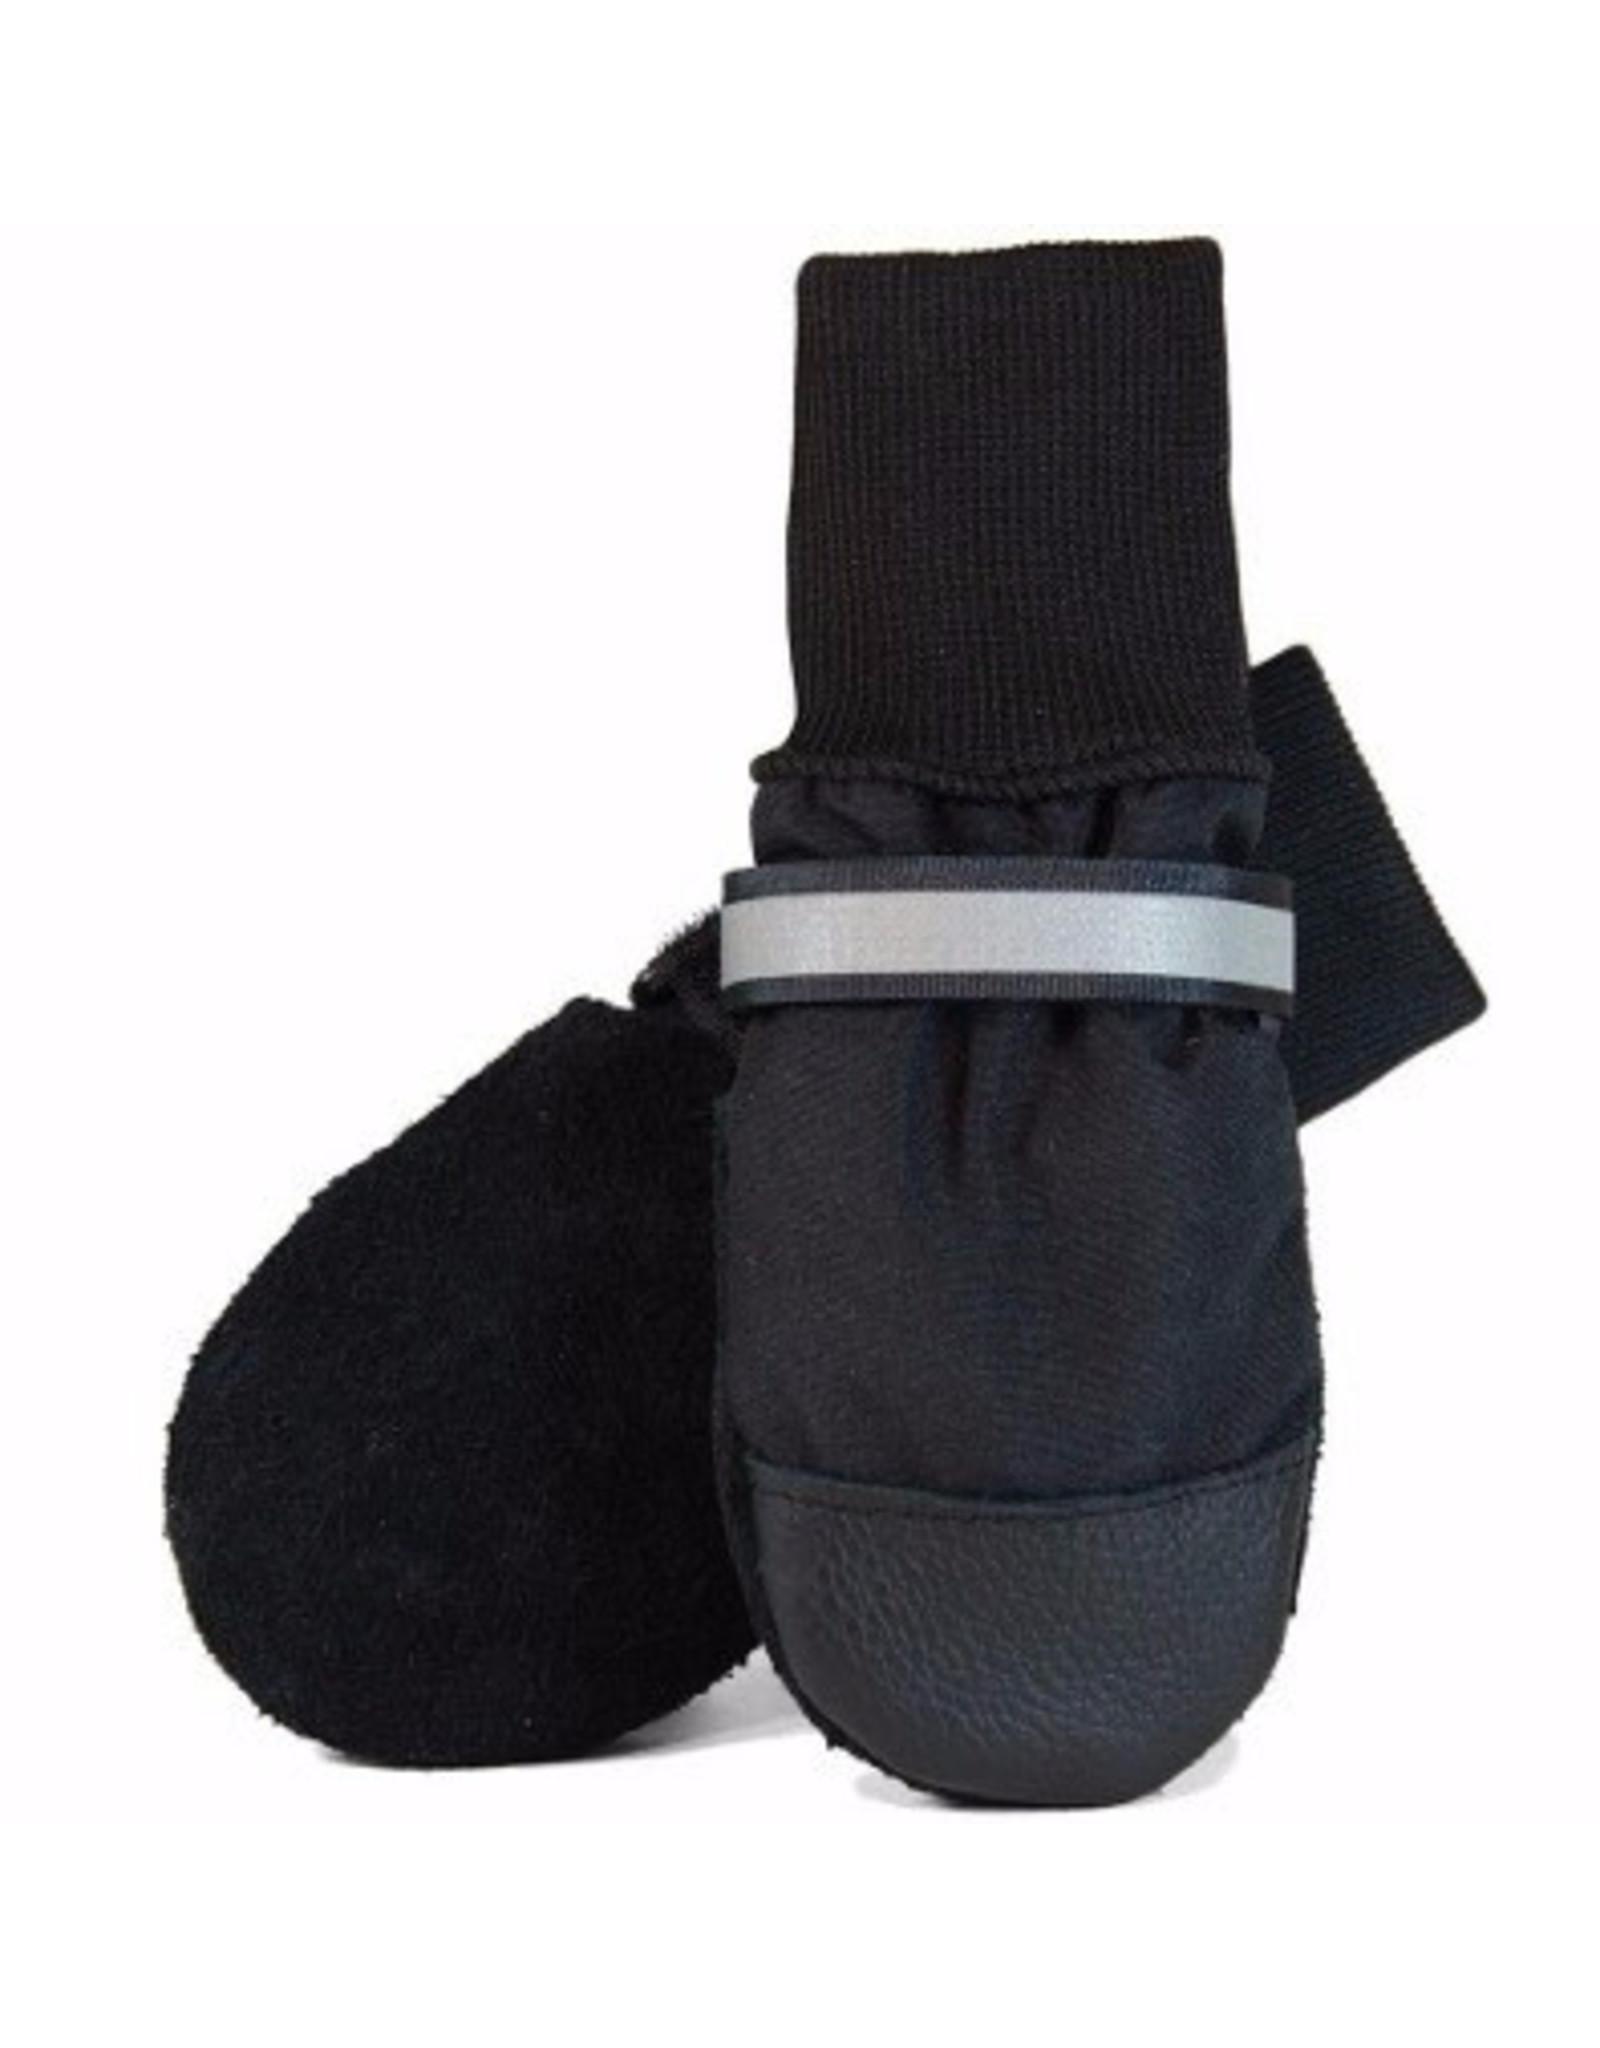 Muttluks Muttluks All-Weather Boots - Black XS